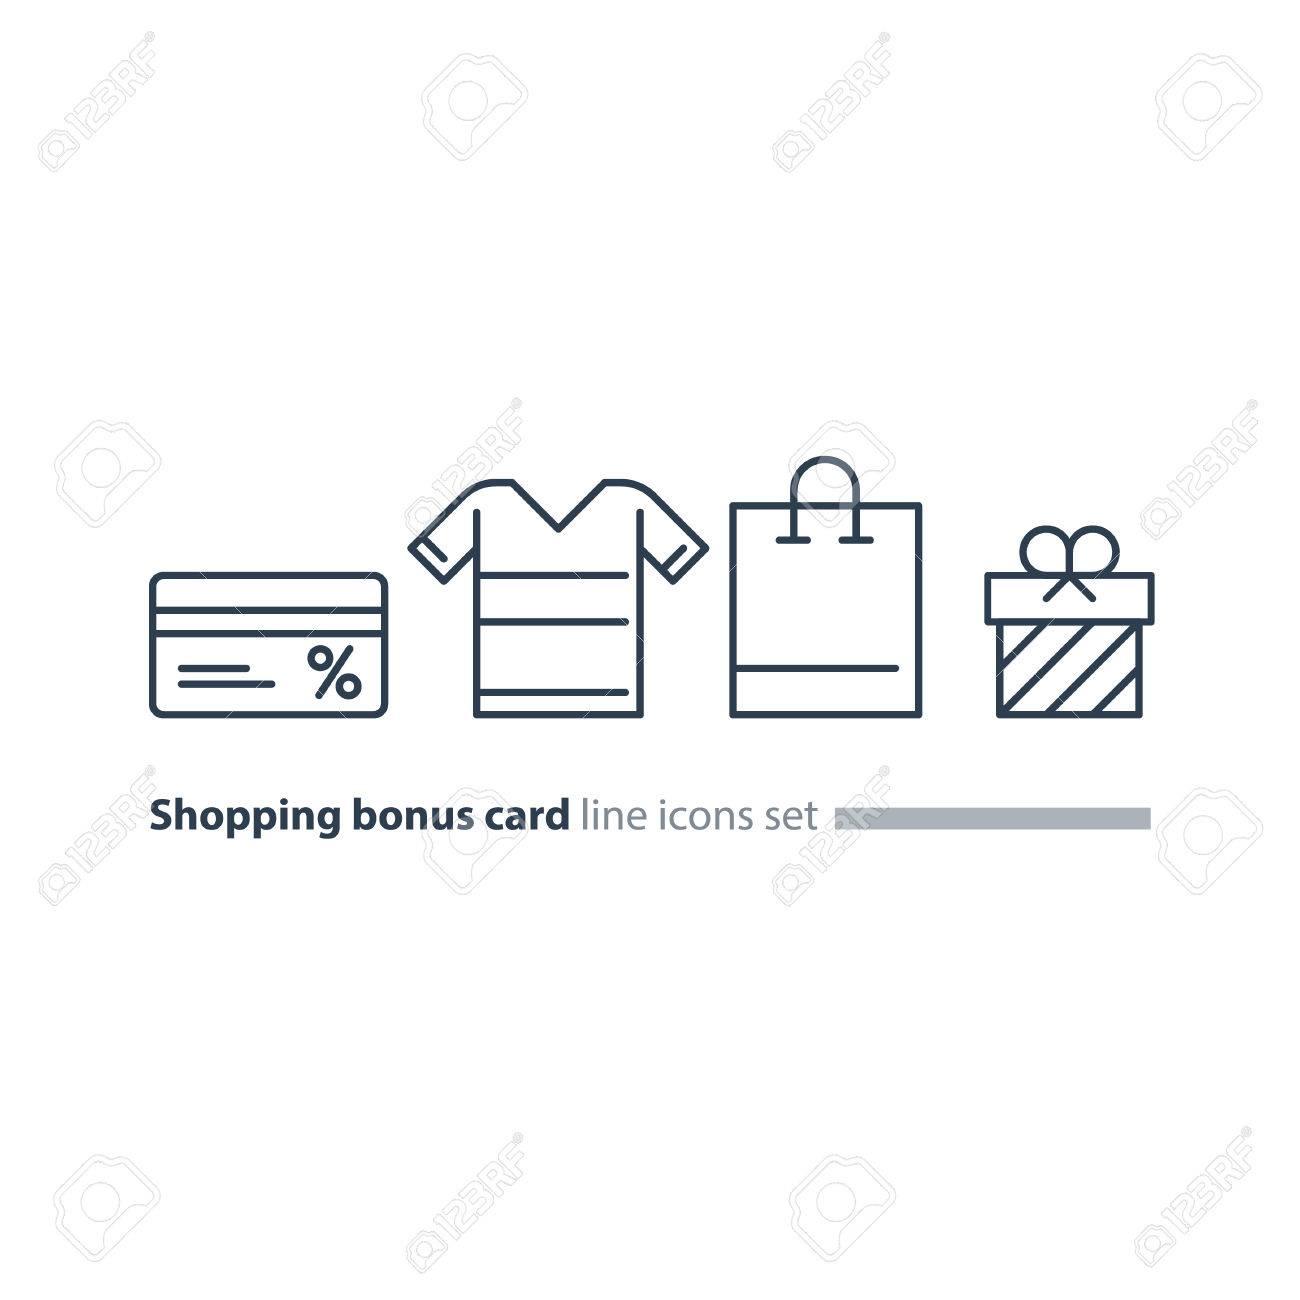 Bonus gift card, shopping bag, buy clothes, vector line icons - 74641483